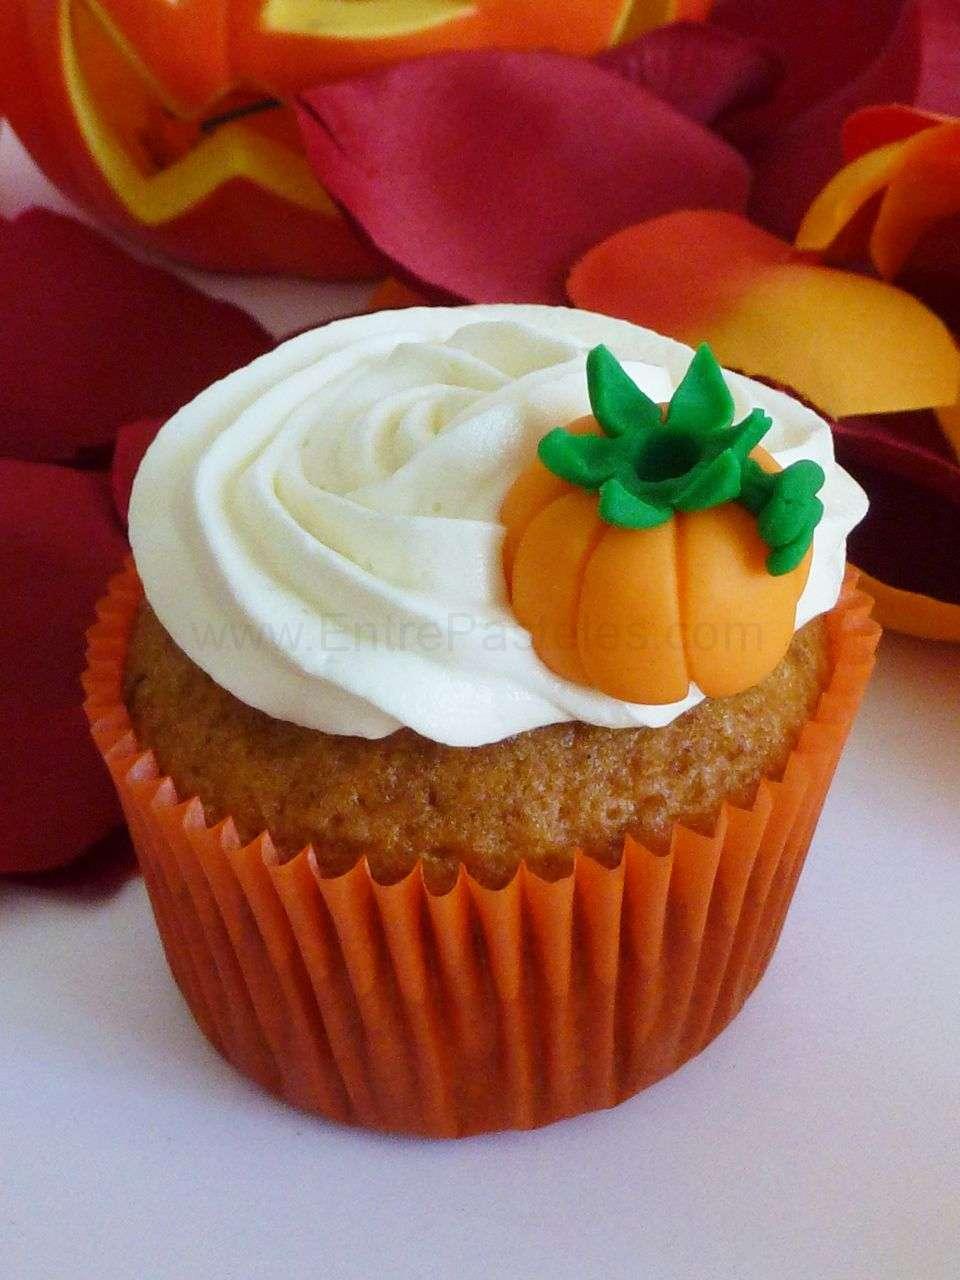 2013-10-18-12h29m08s-cupcakescalabaza